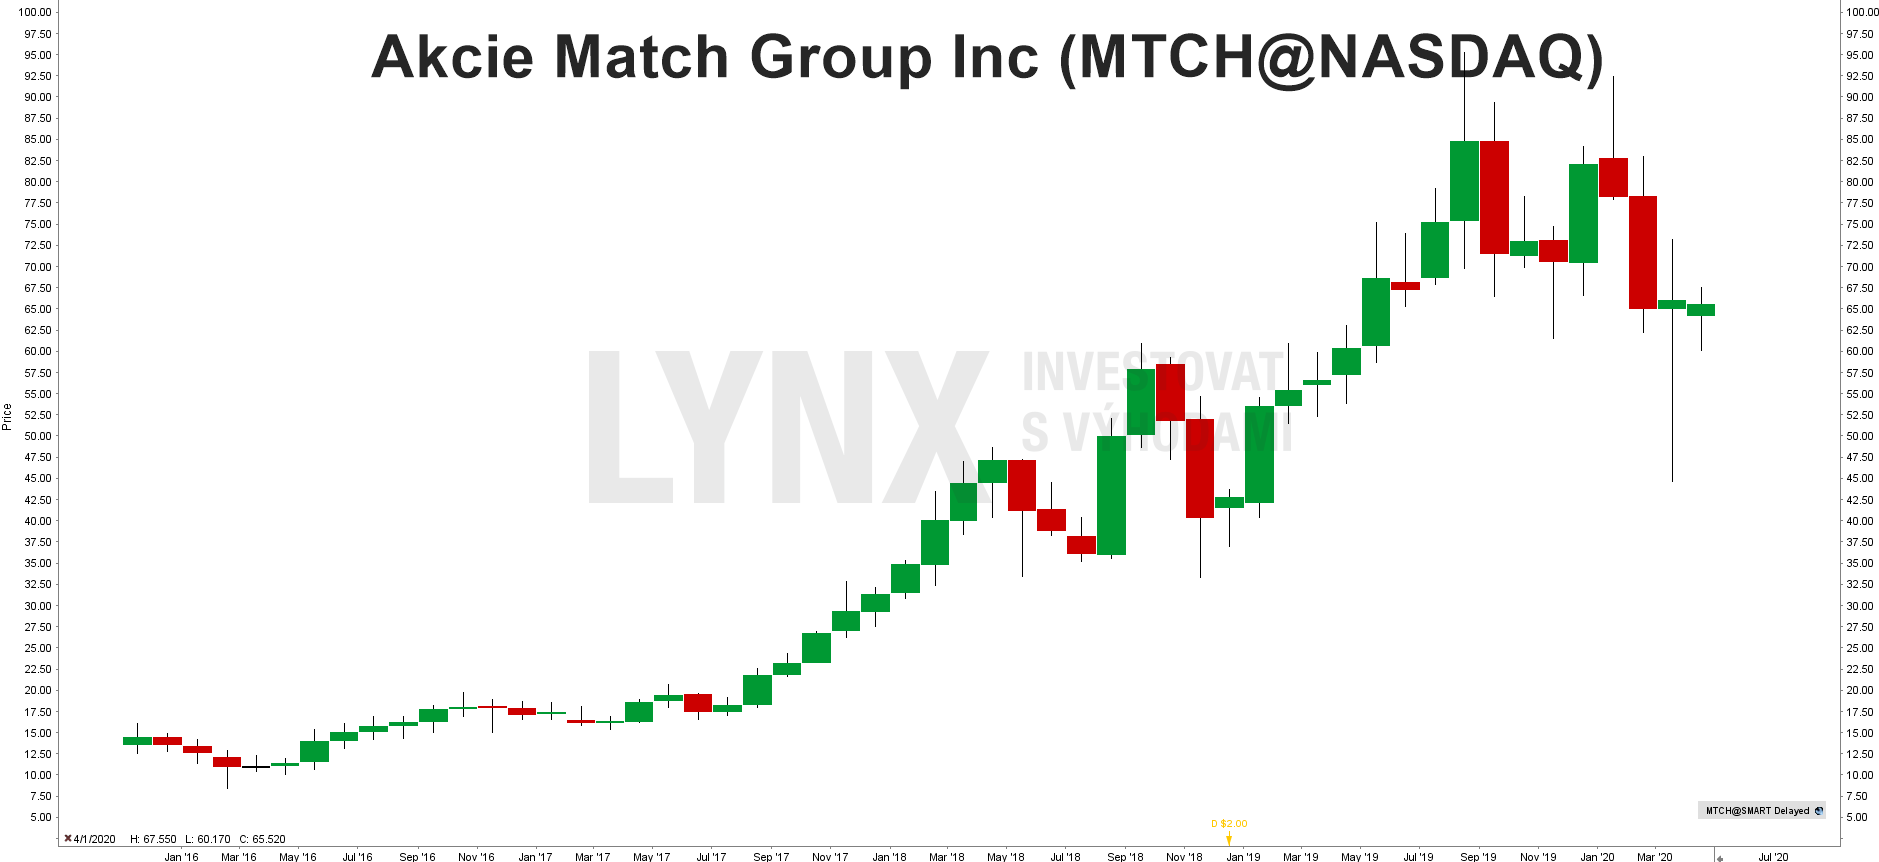 Graf akcie Match Group